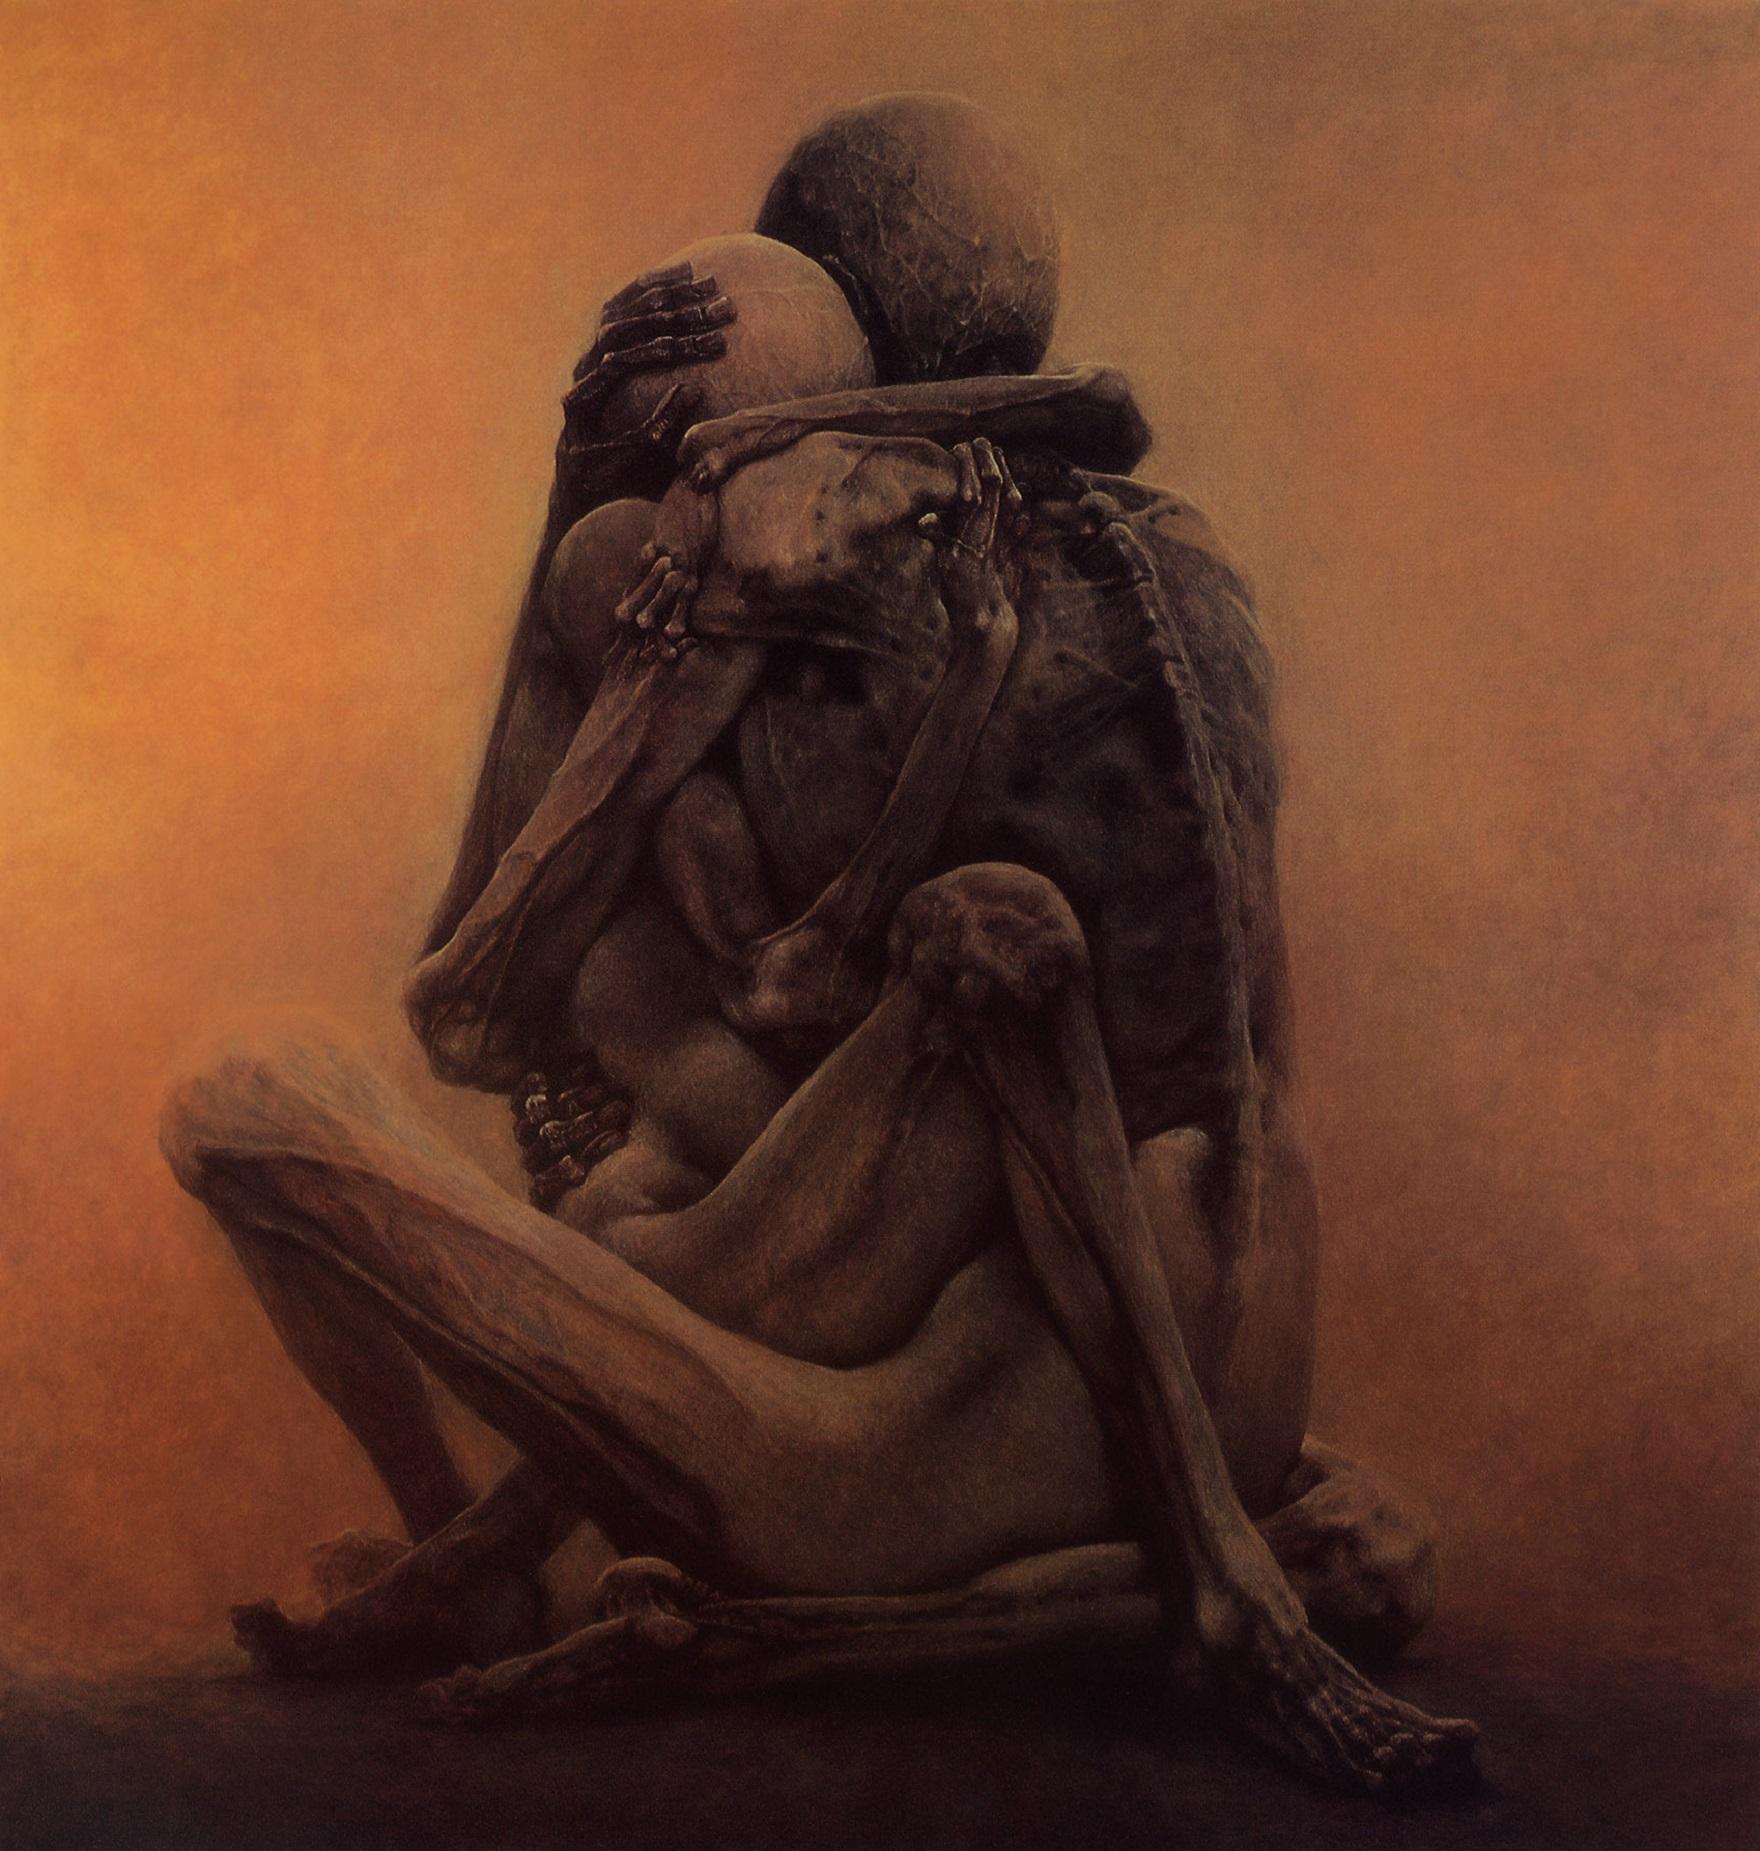 Untitled_painting_by_Zdzislaw_Beksinski_1984